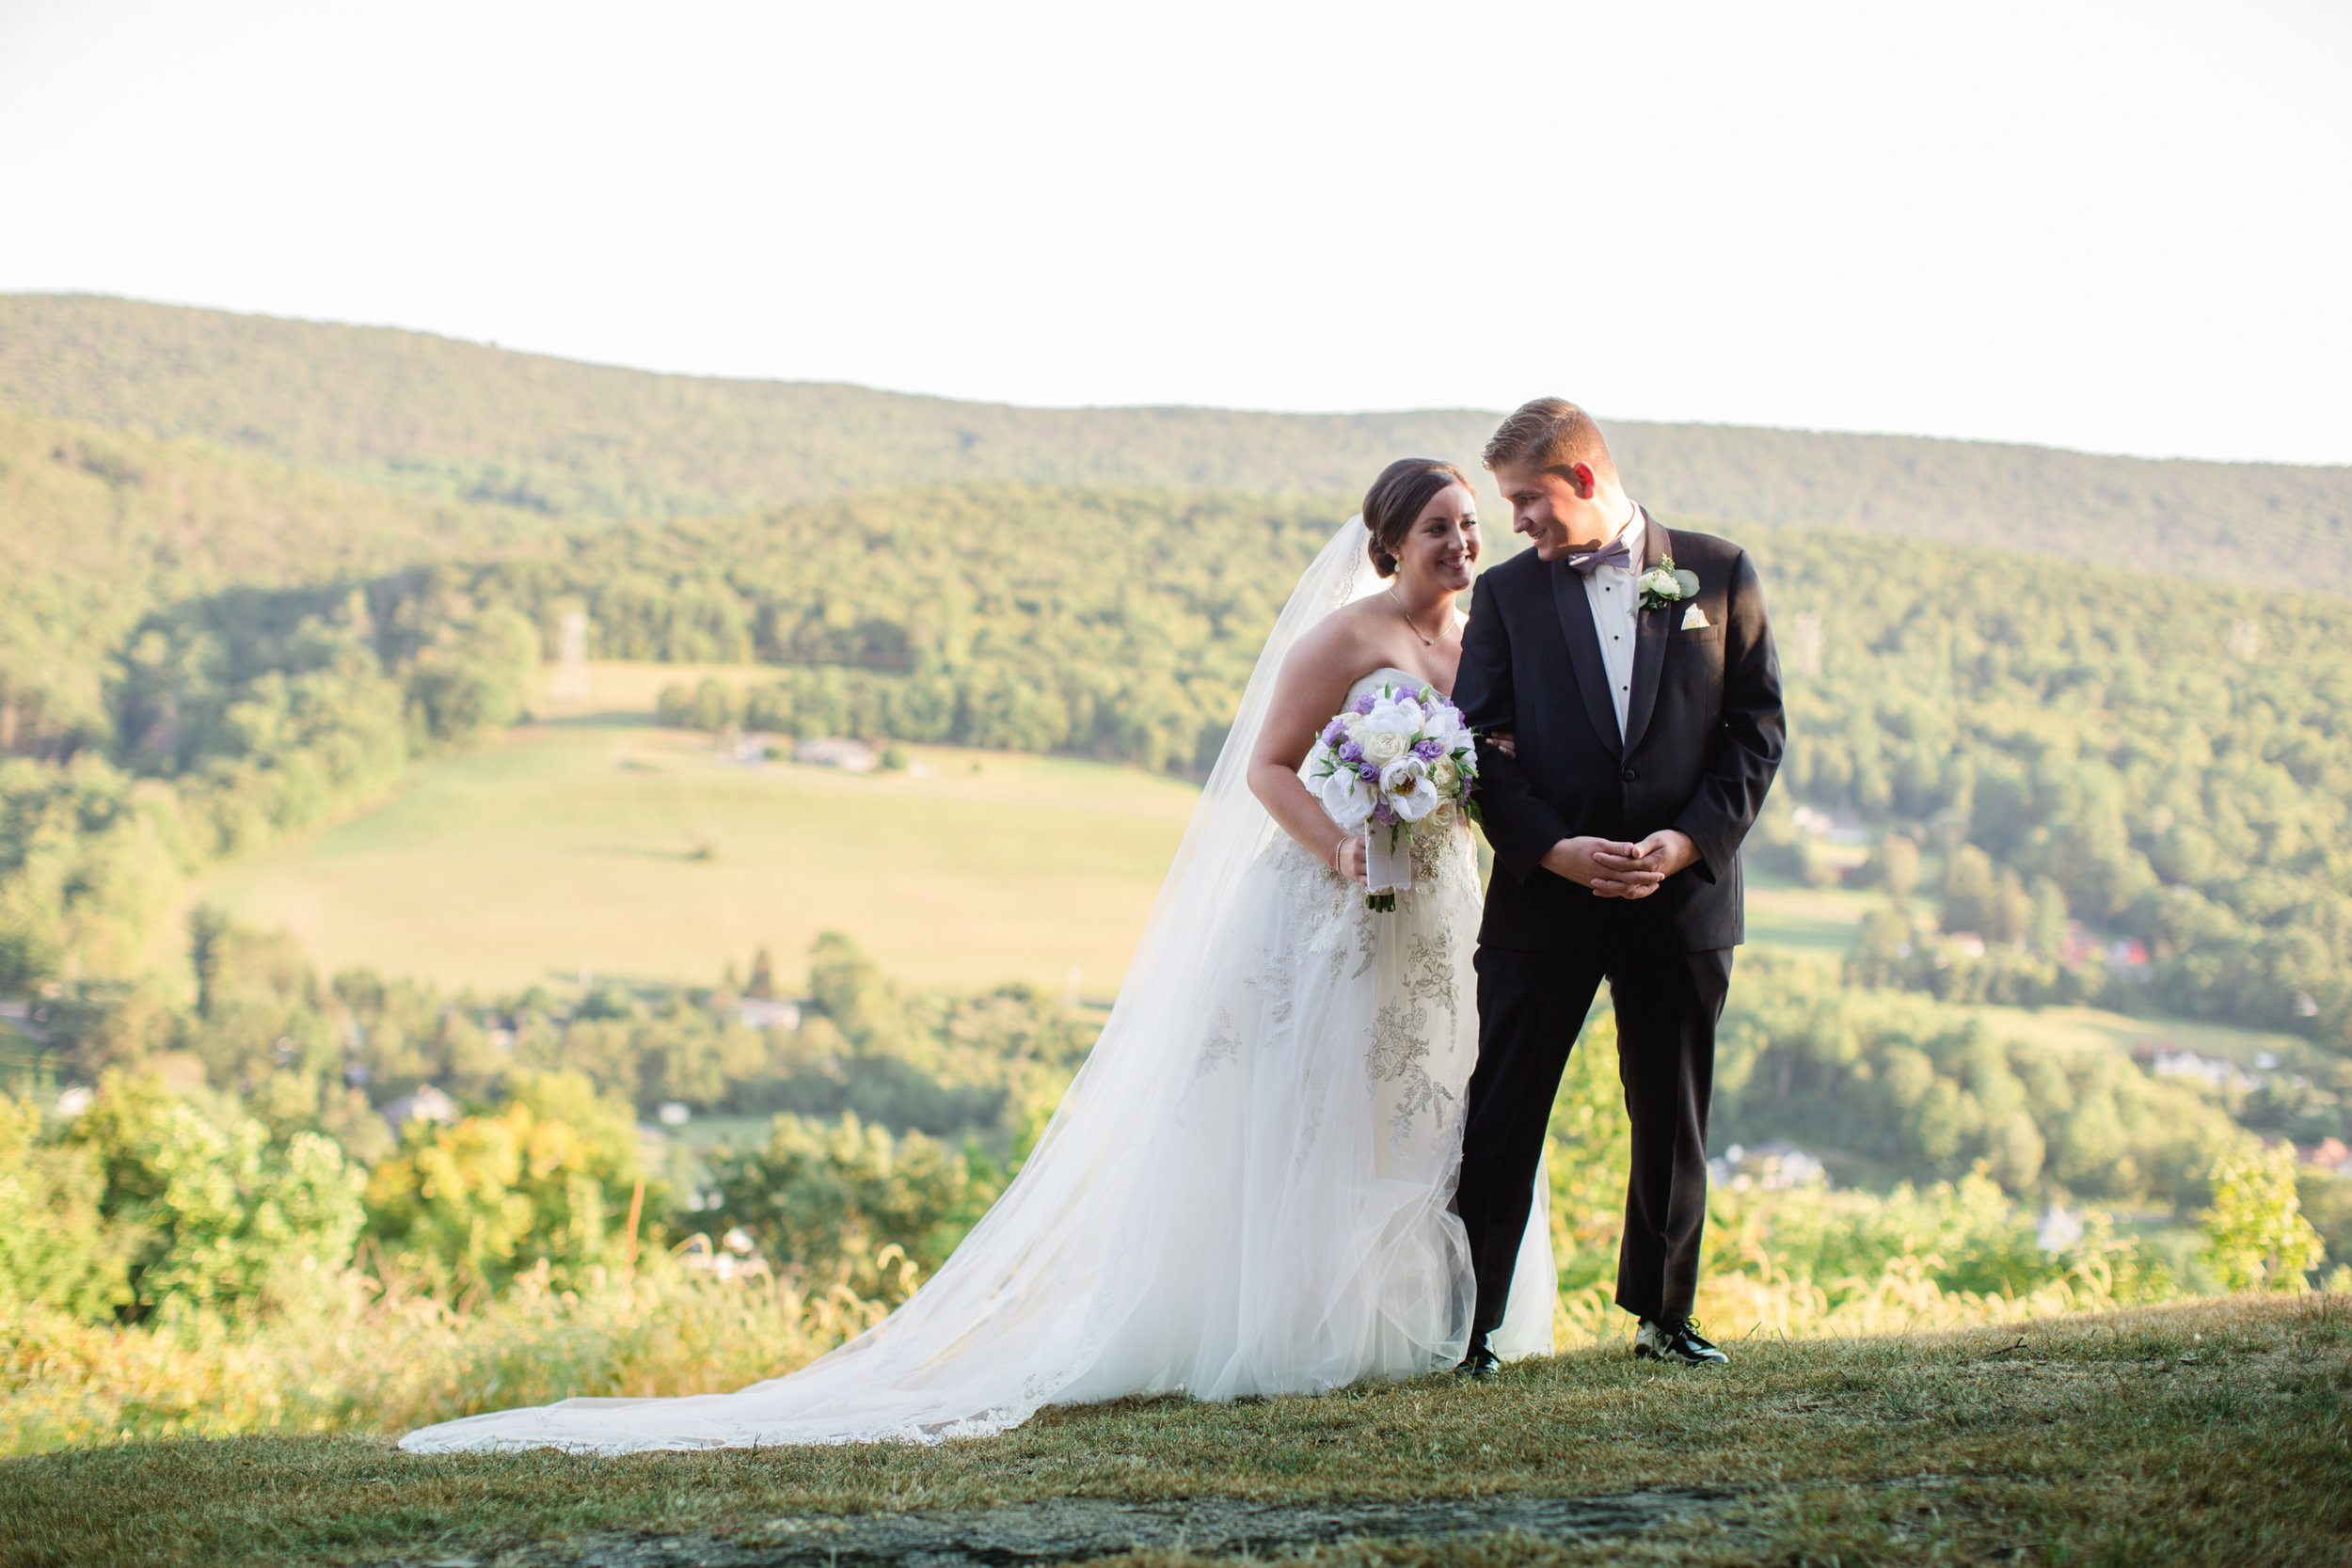 Scranton PA Lawnhaven Stroudsmoor Wedding Photography_JDP-0938.jpg